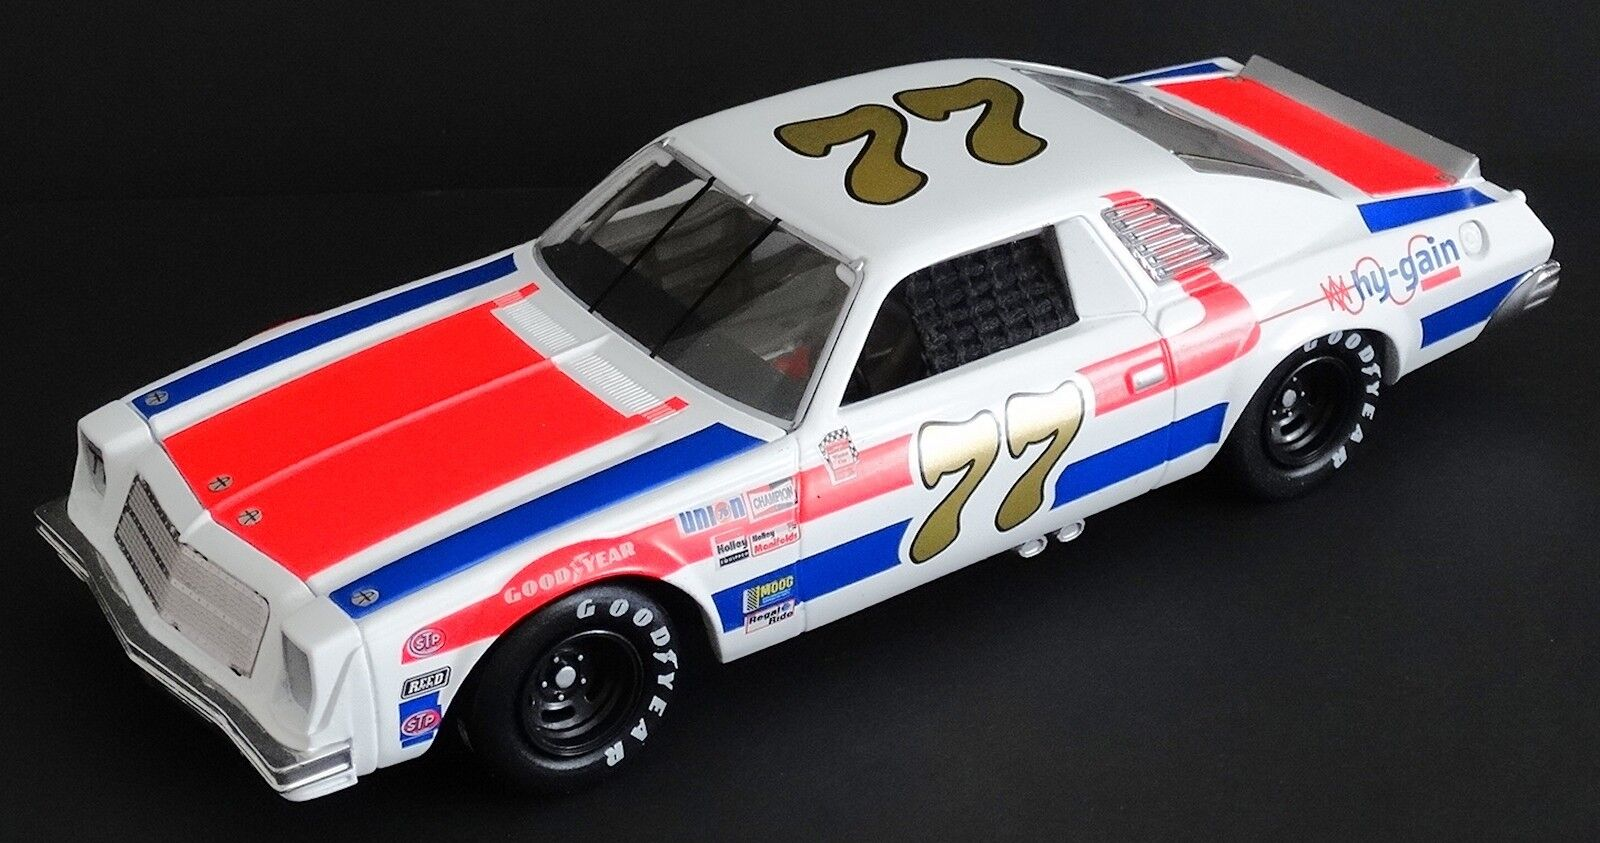 Dale Earnhardt, Sr.  77 Hy-Gain Hy-Gain Hy-Gain 1 24 Rcca Elite 1976 Chevrolet Malibu 1371 2500 1adcc8